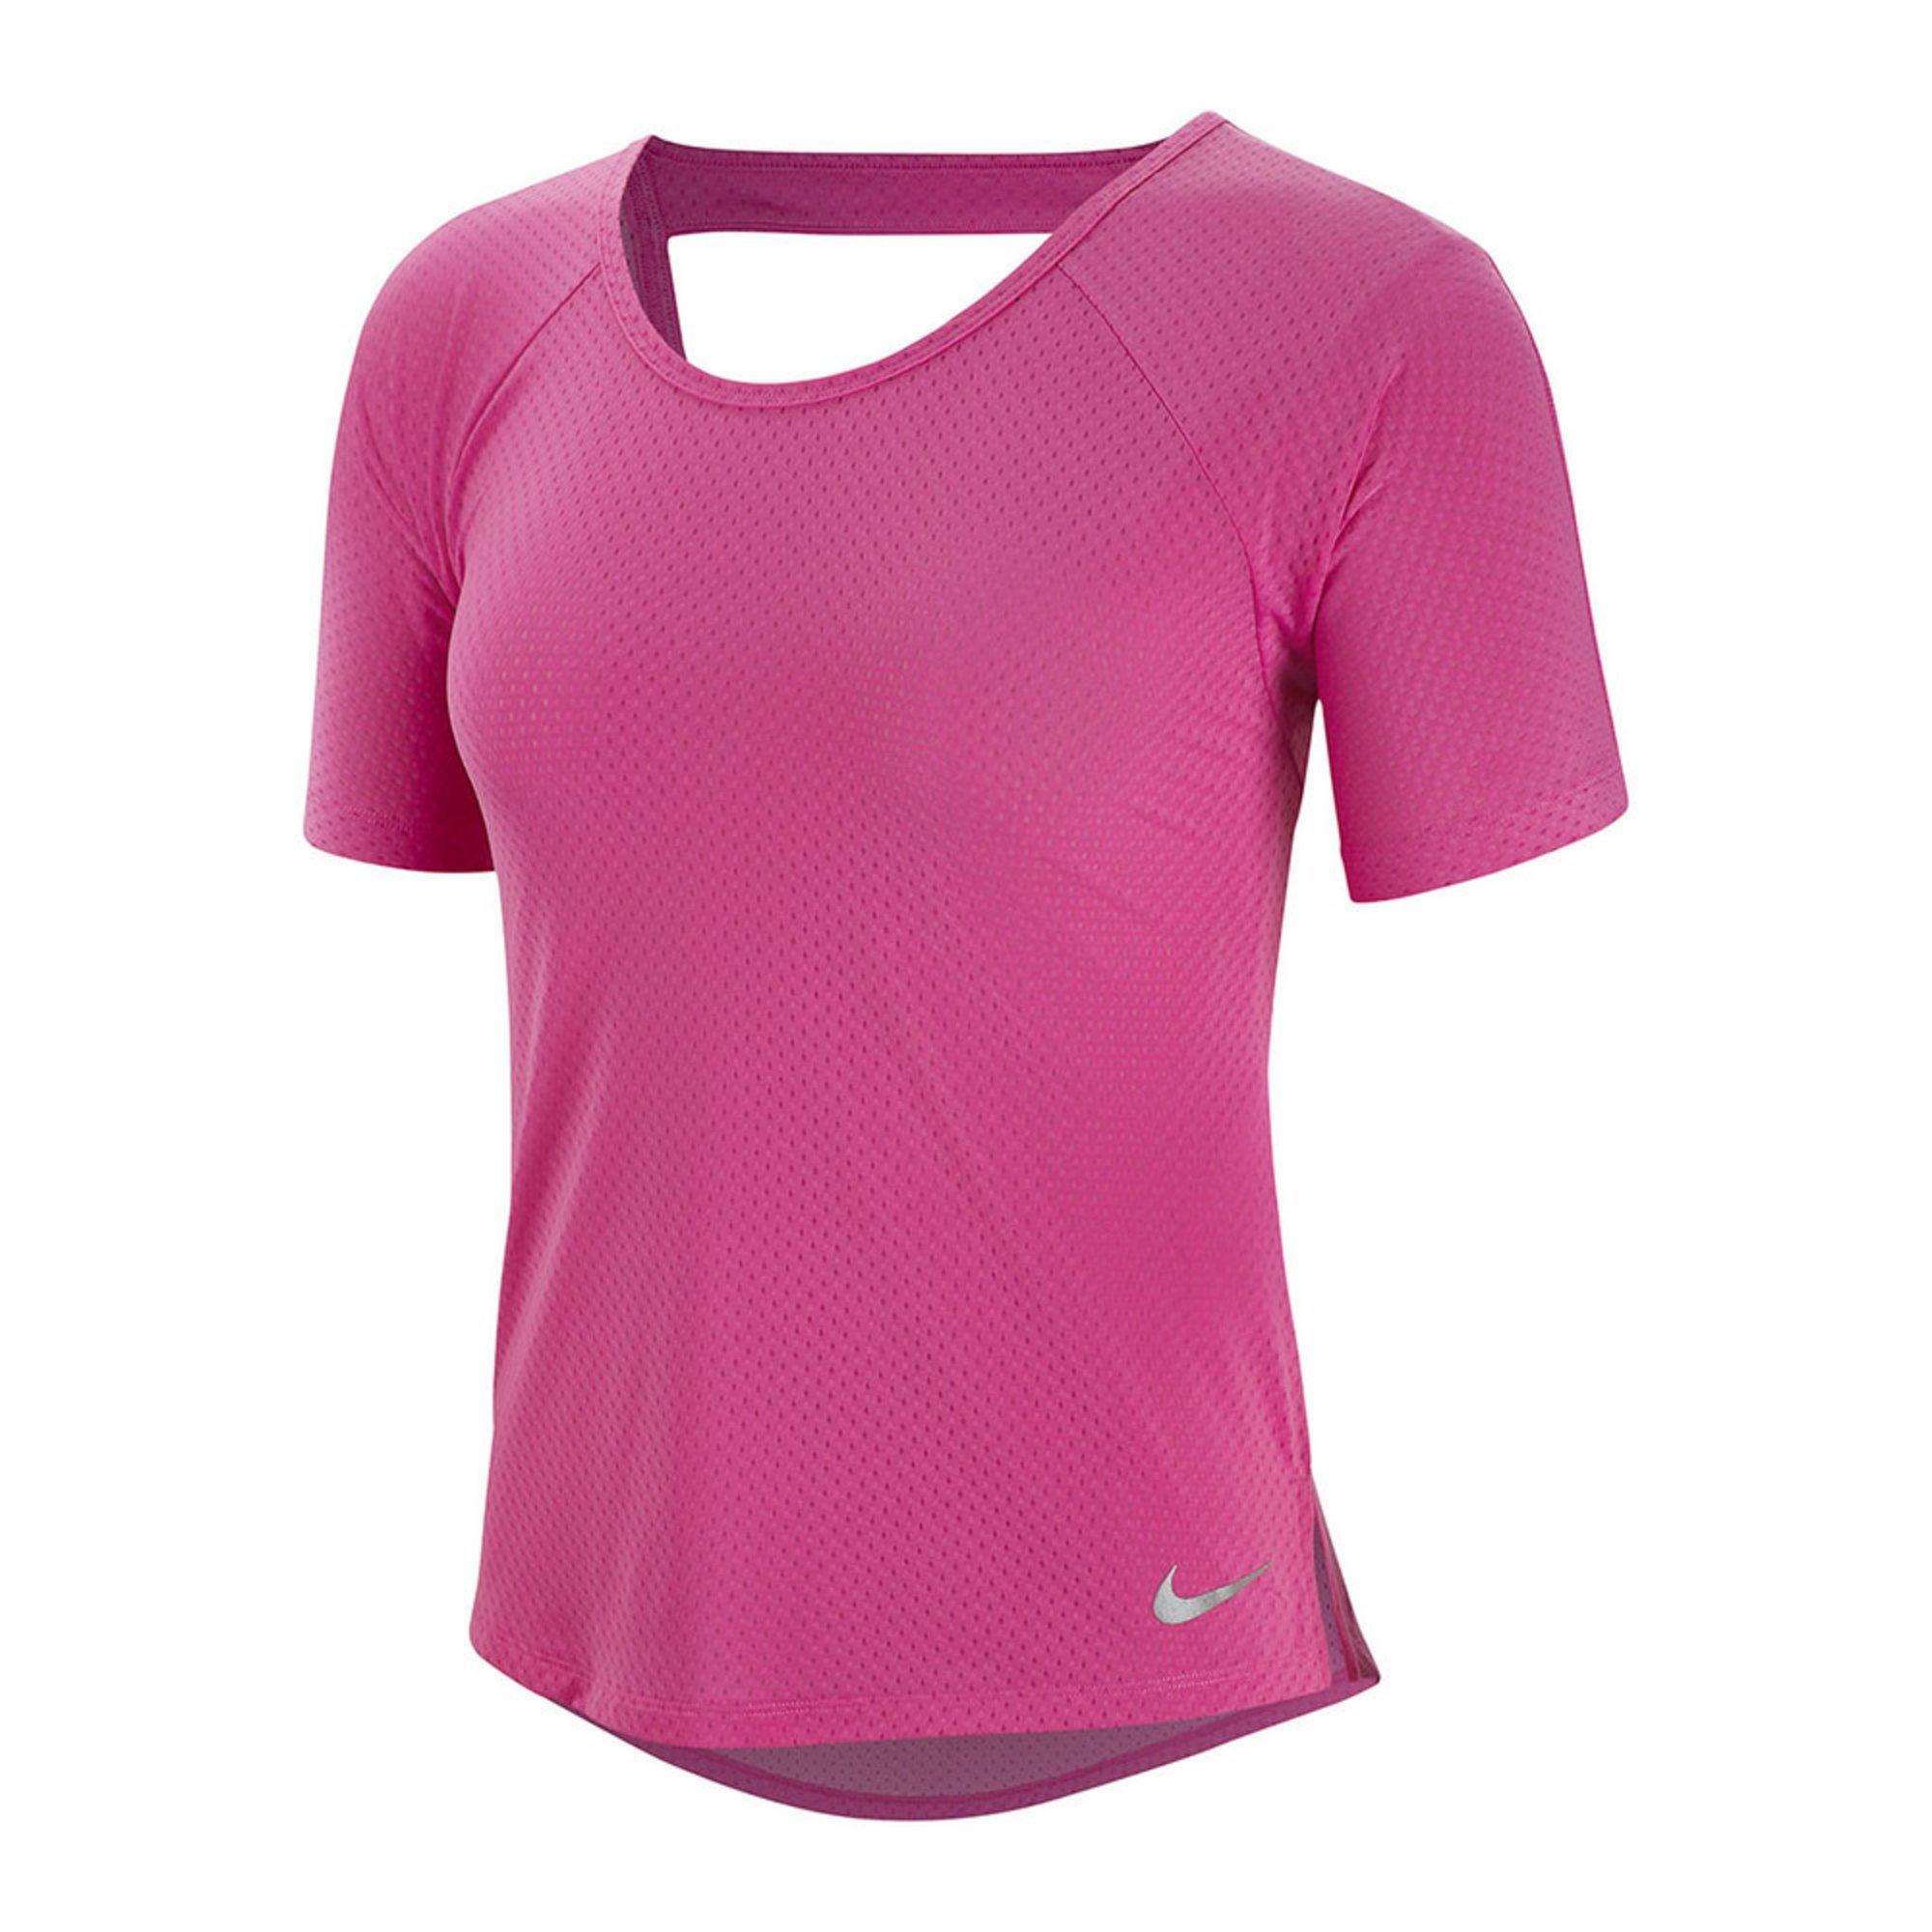 Tops Short Sleeve Breathe Teesamp; Nike Miller TopActive